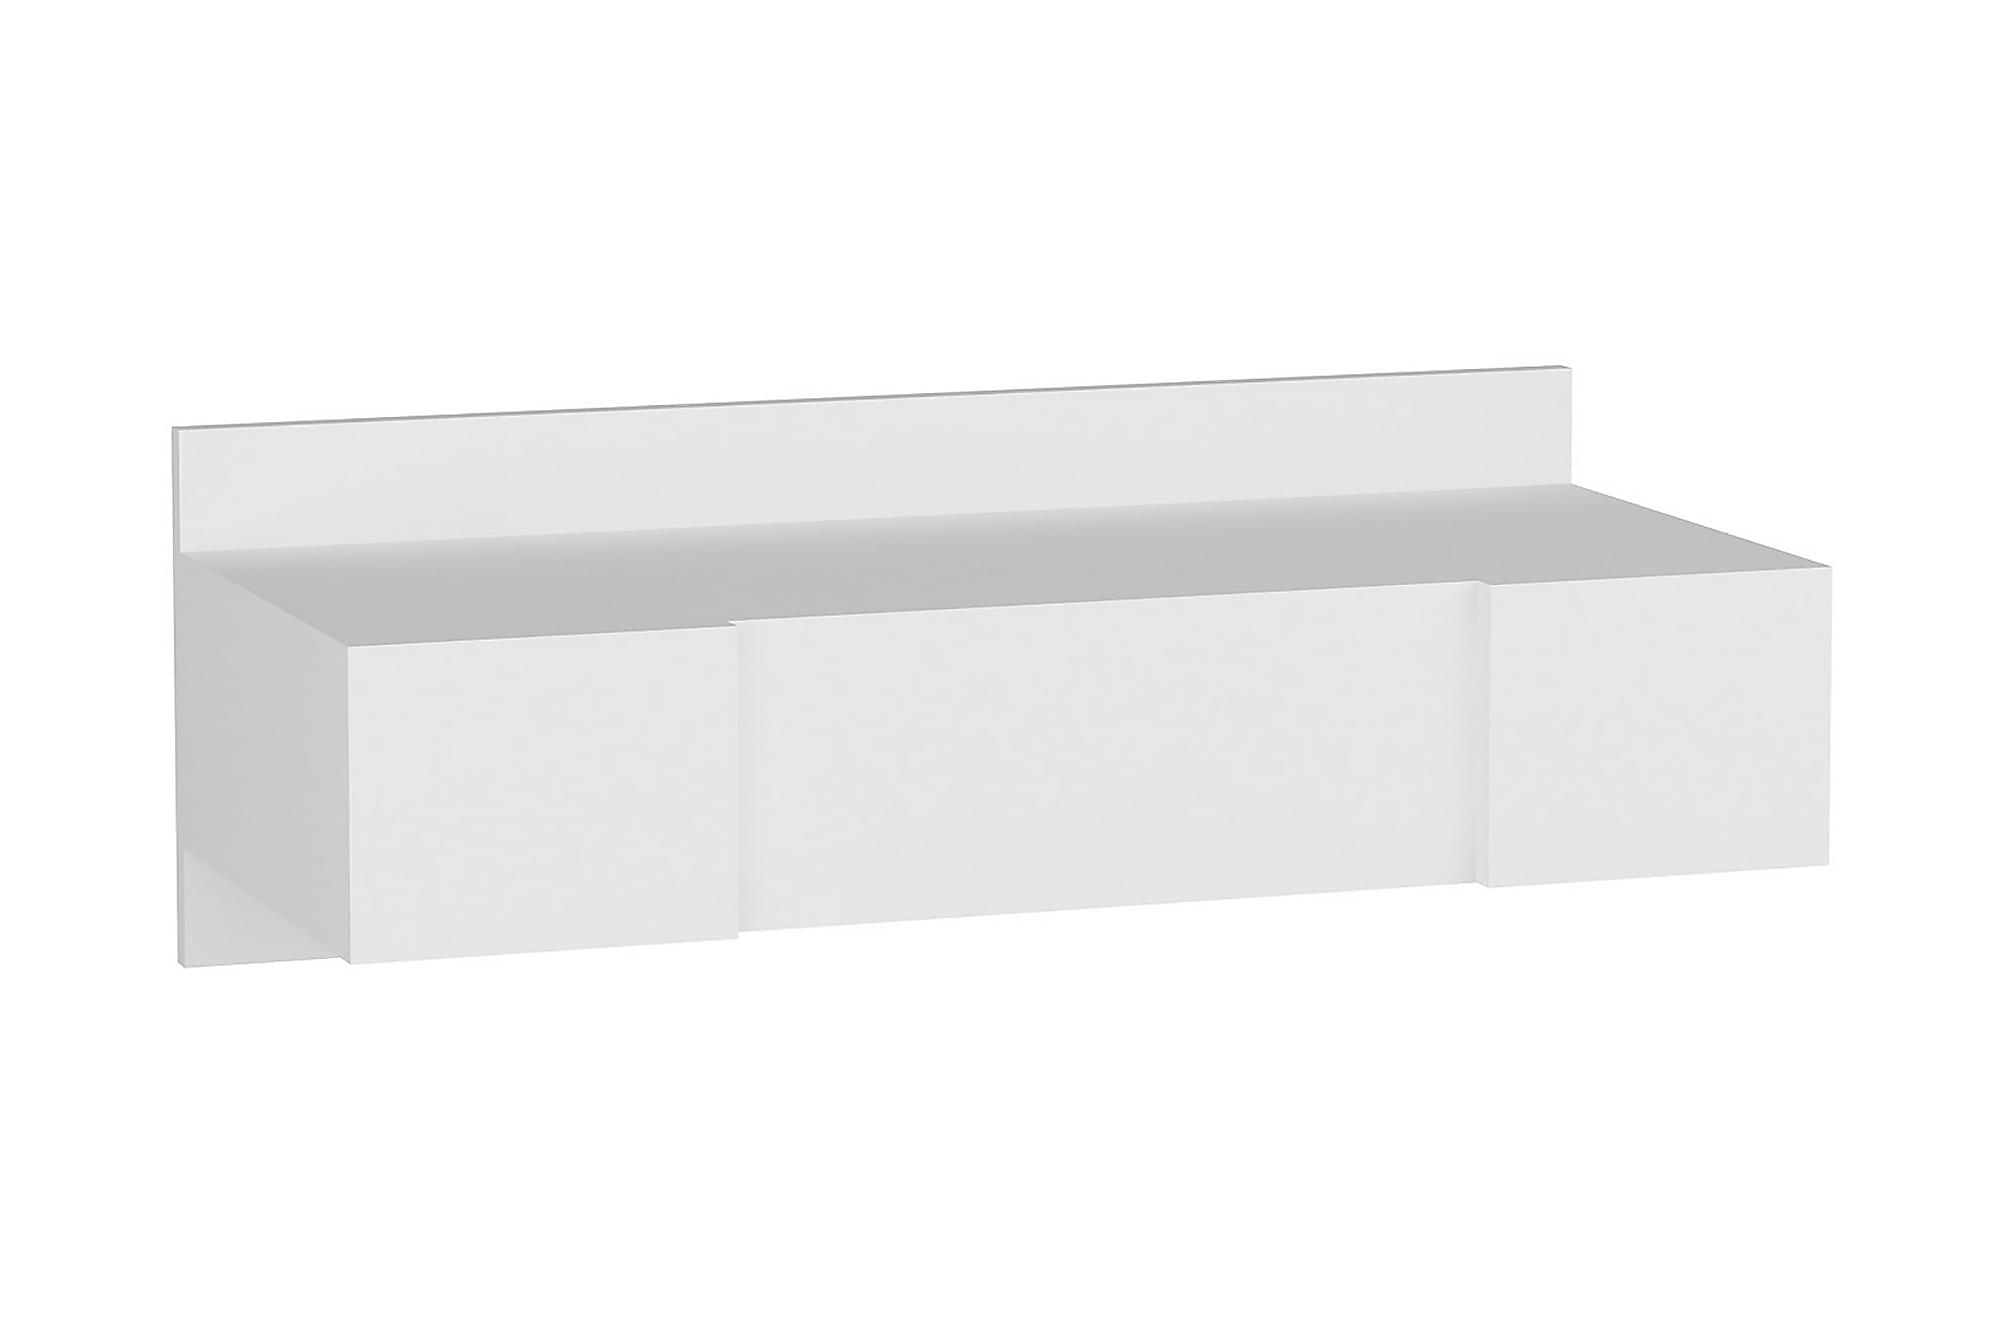 DEBOSE Sminkbord 100 cm Vit, Sminkbord